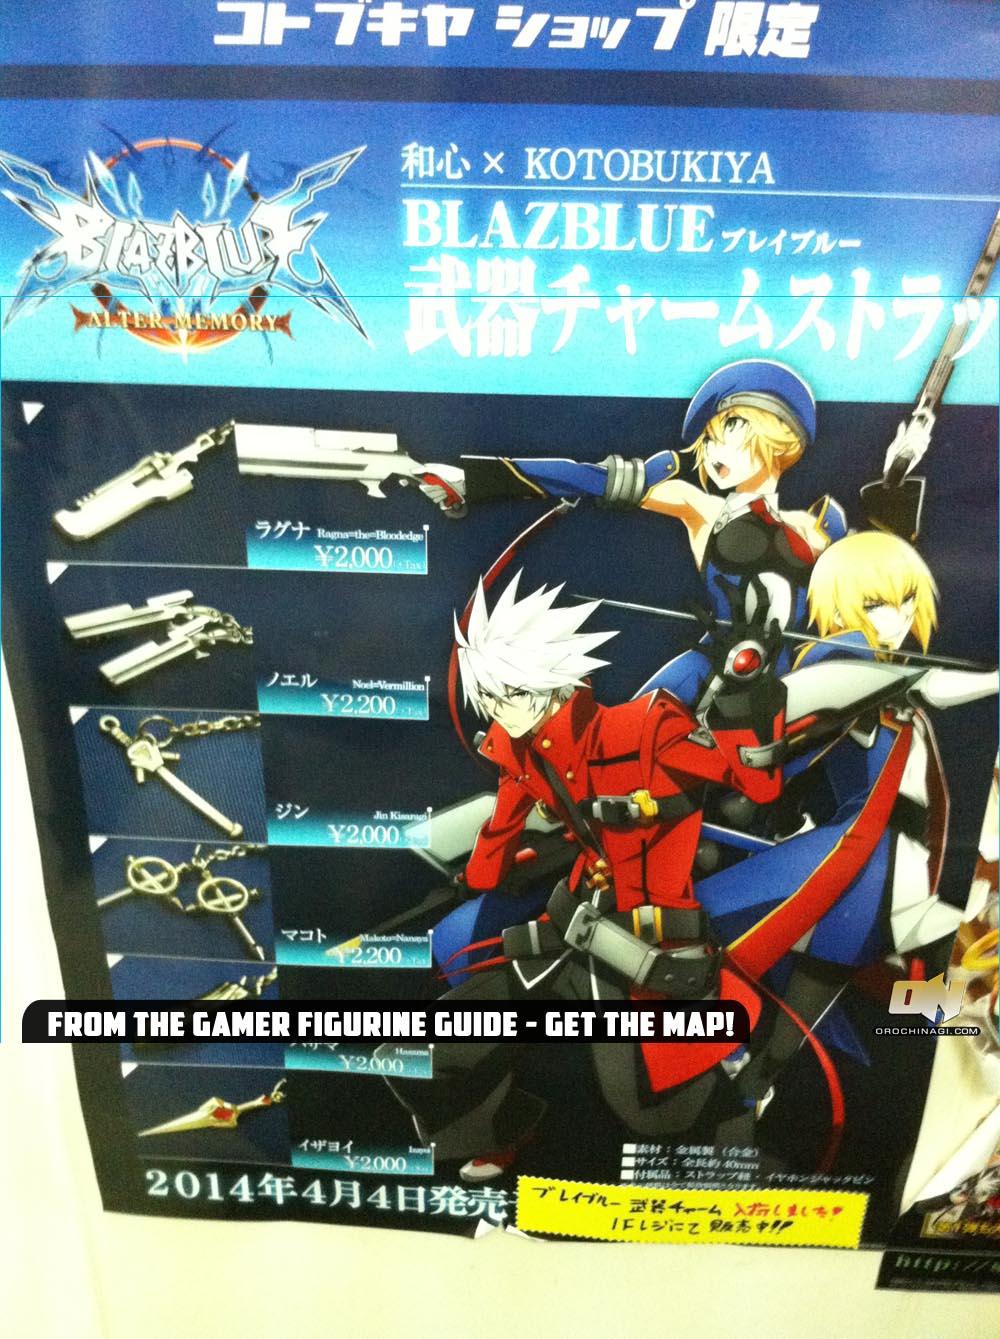 Orochinagi_Akihabara_Gamer_Figurine_Guide_076